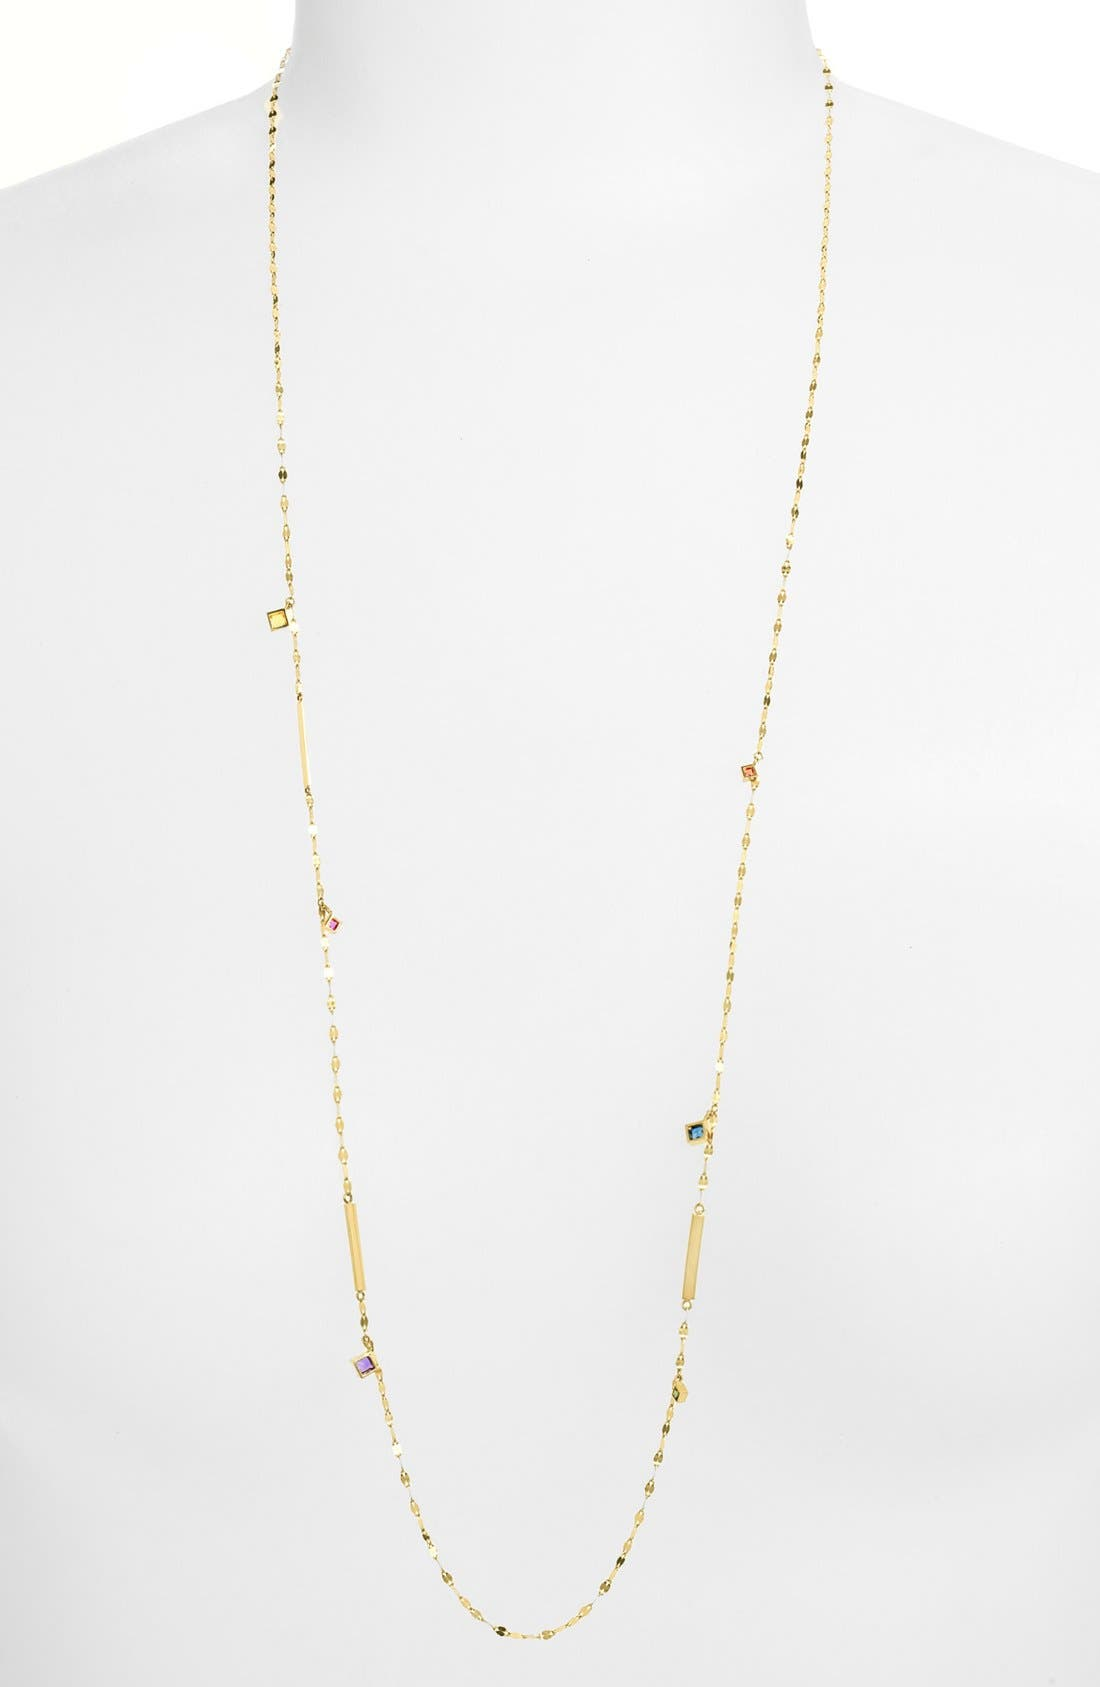 Main Image - Lana Jewelry Long Station Necklace